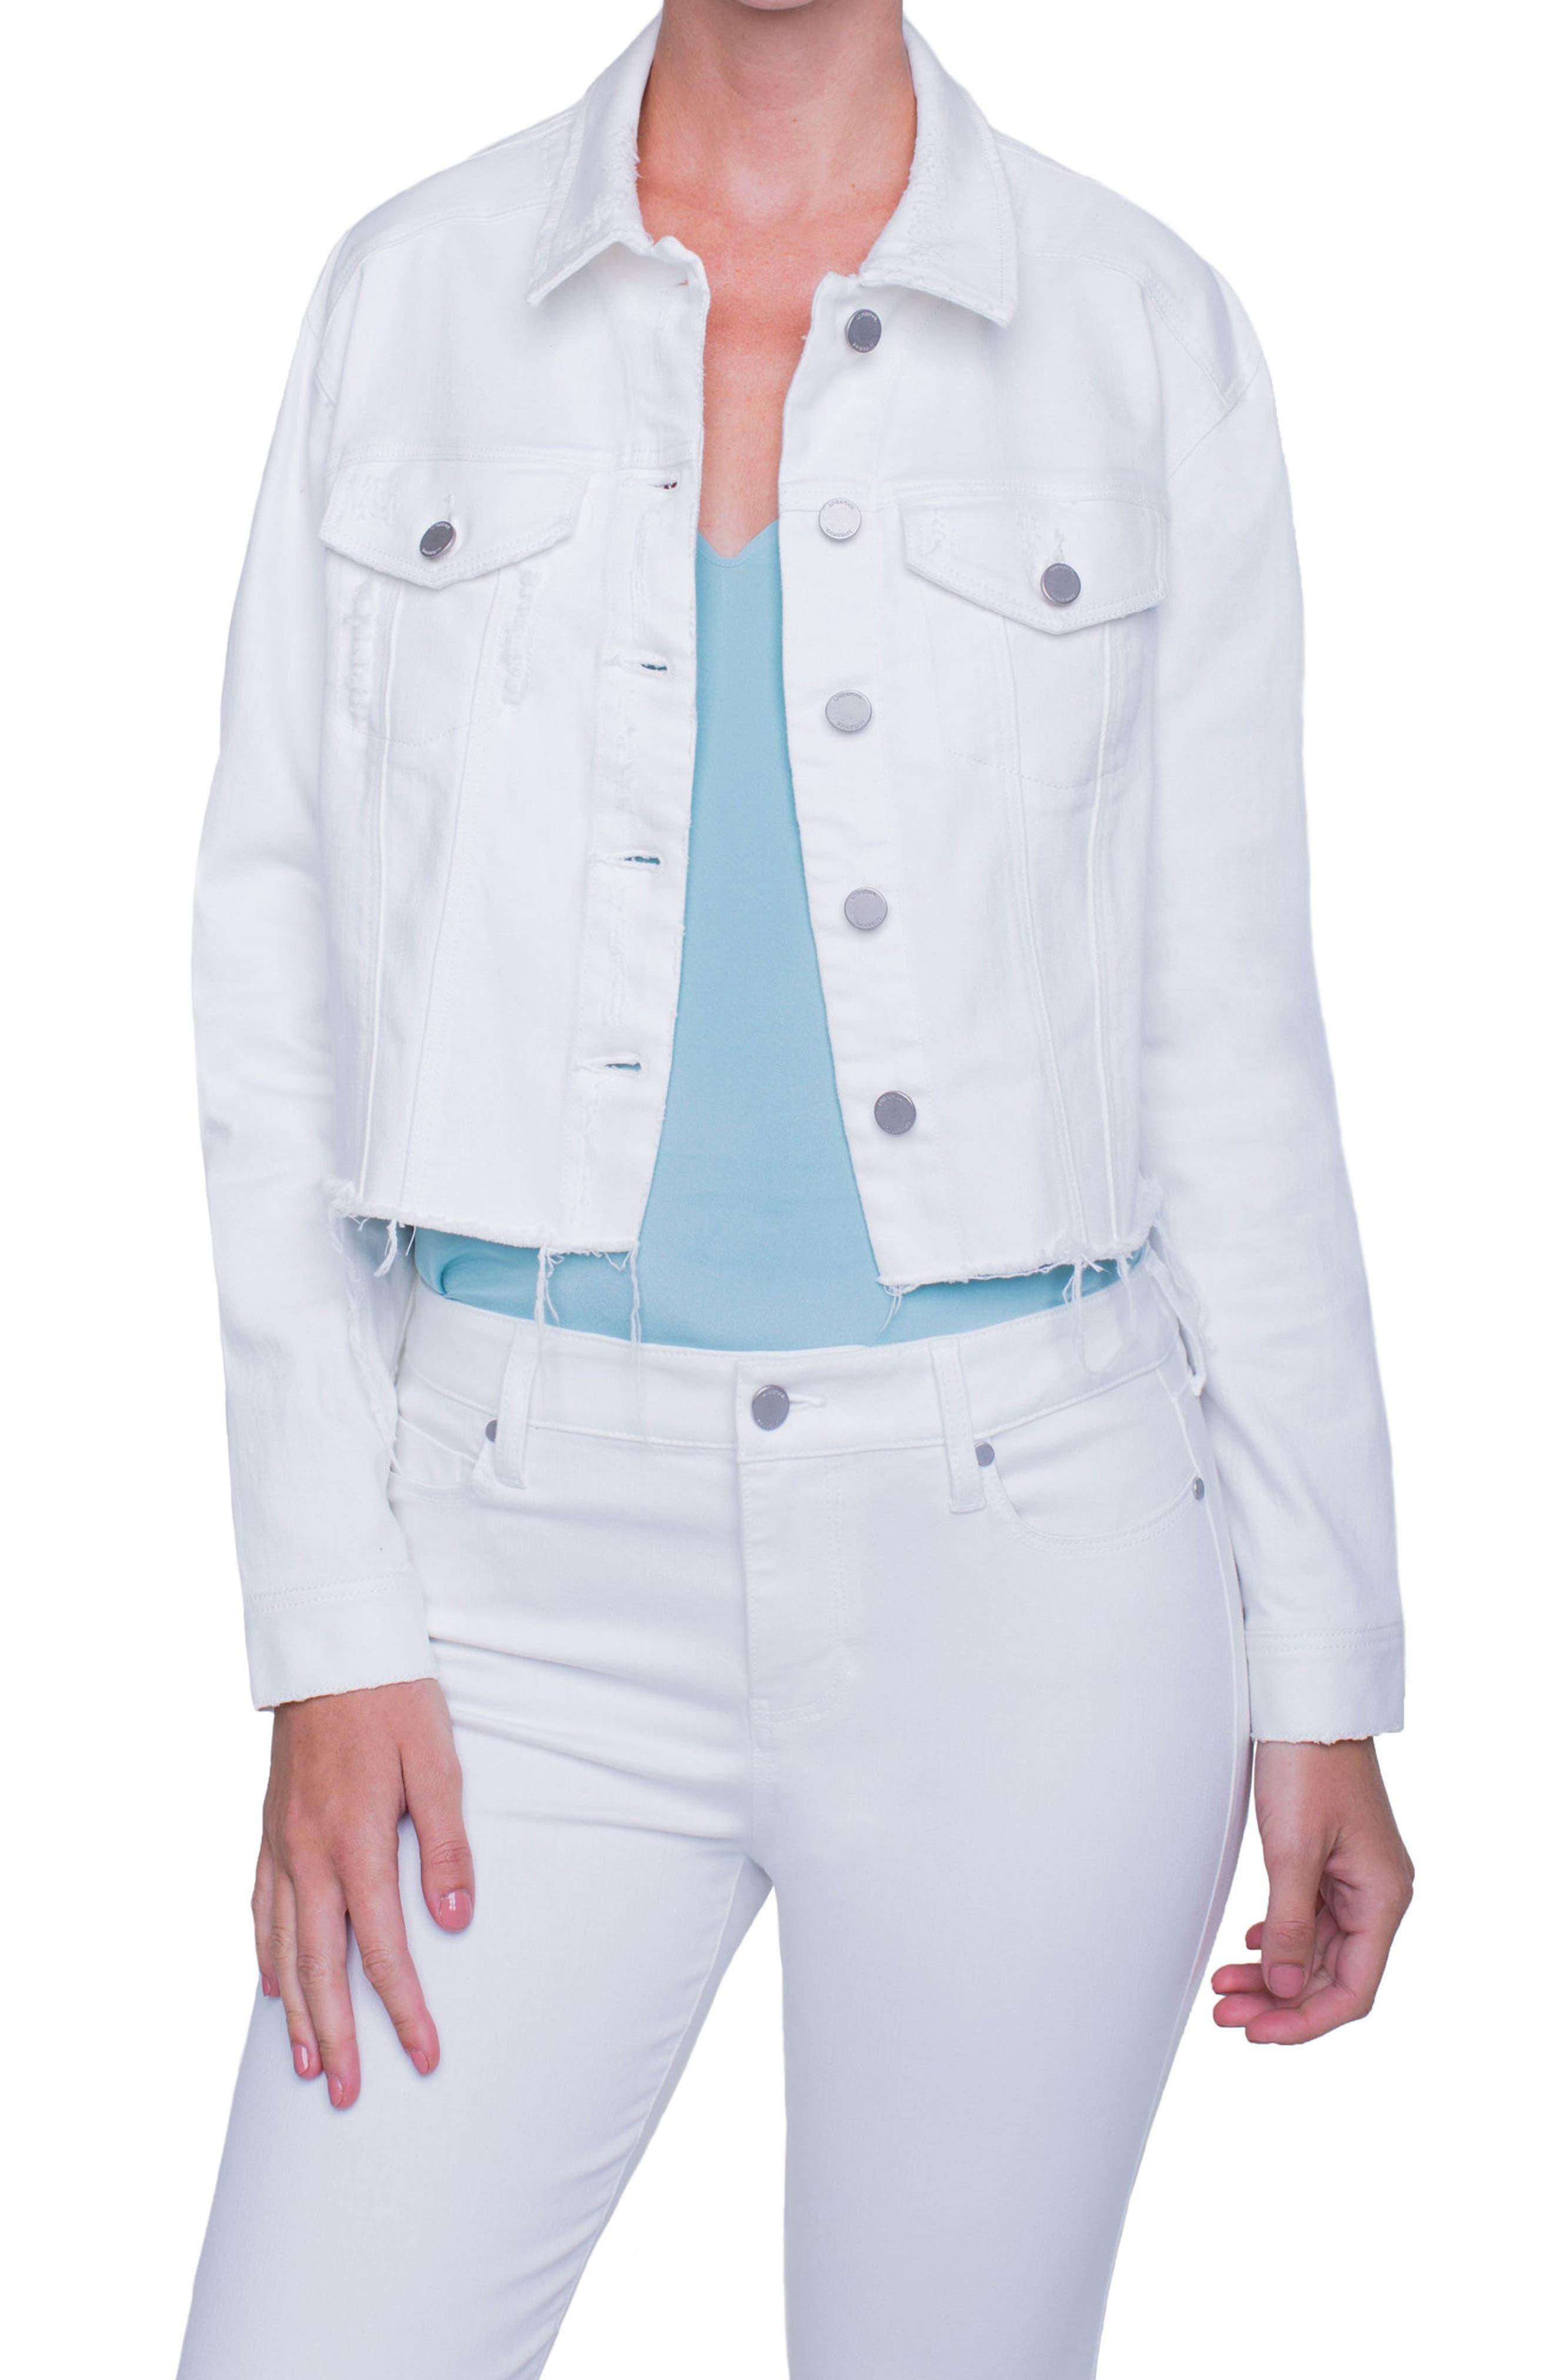 Alternate Image 1 Selected - Liverpool Jeans Company Raw Edge Denim Jacket (Magnolia Destruct)